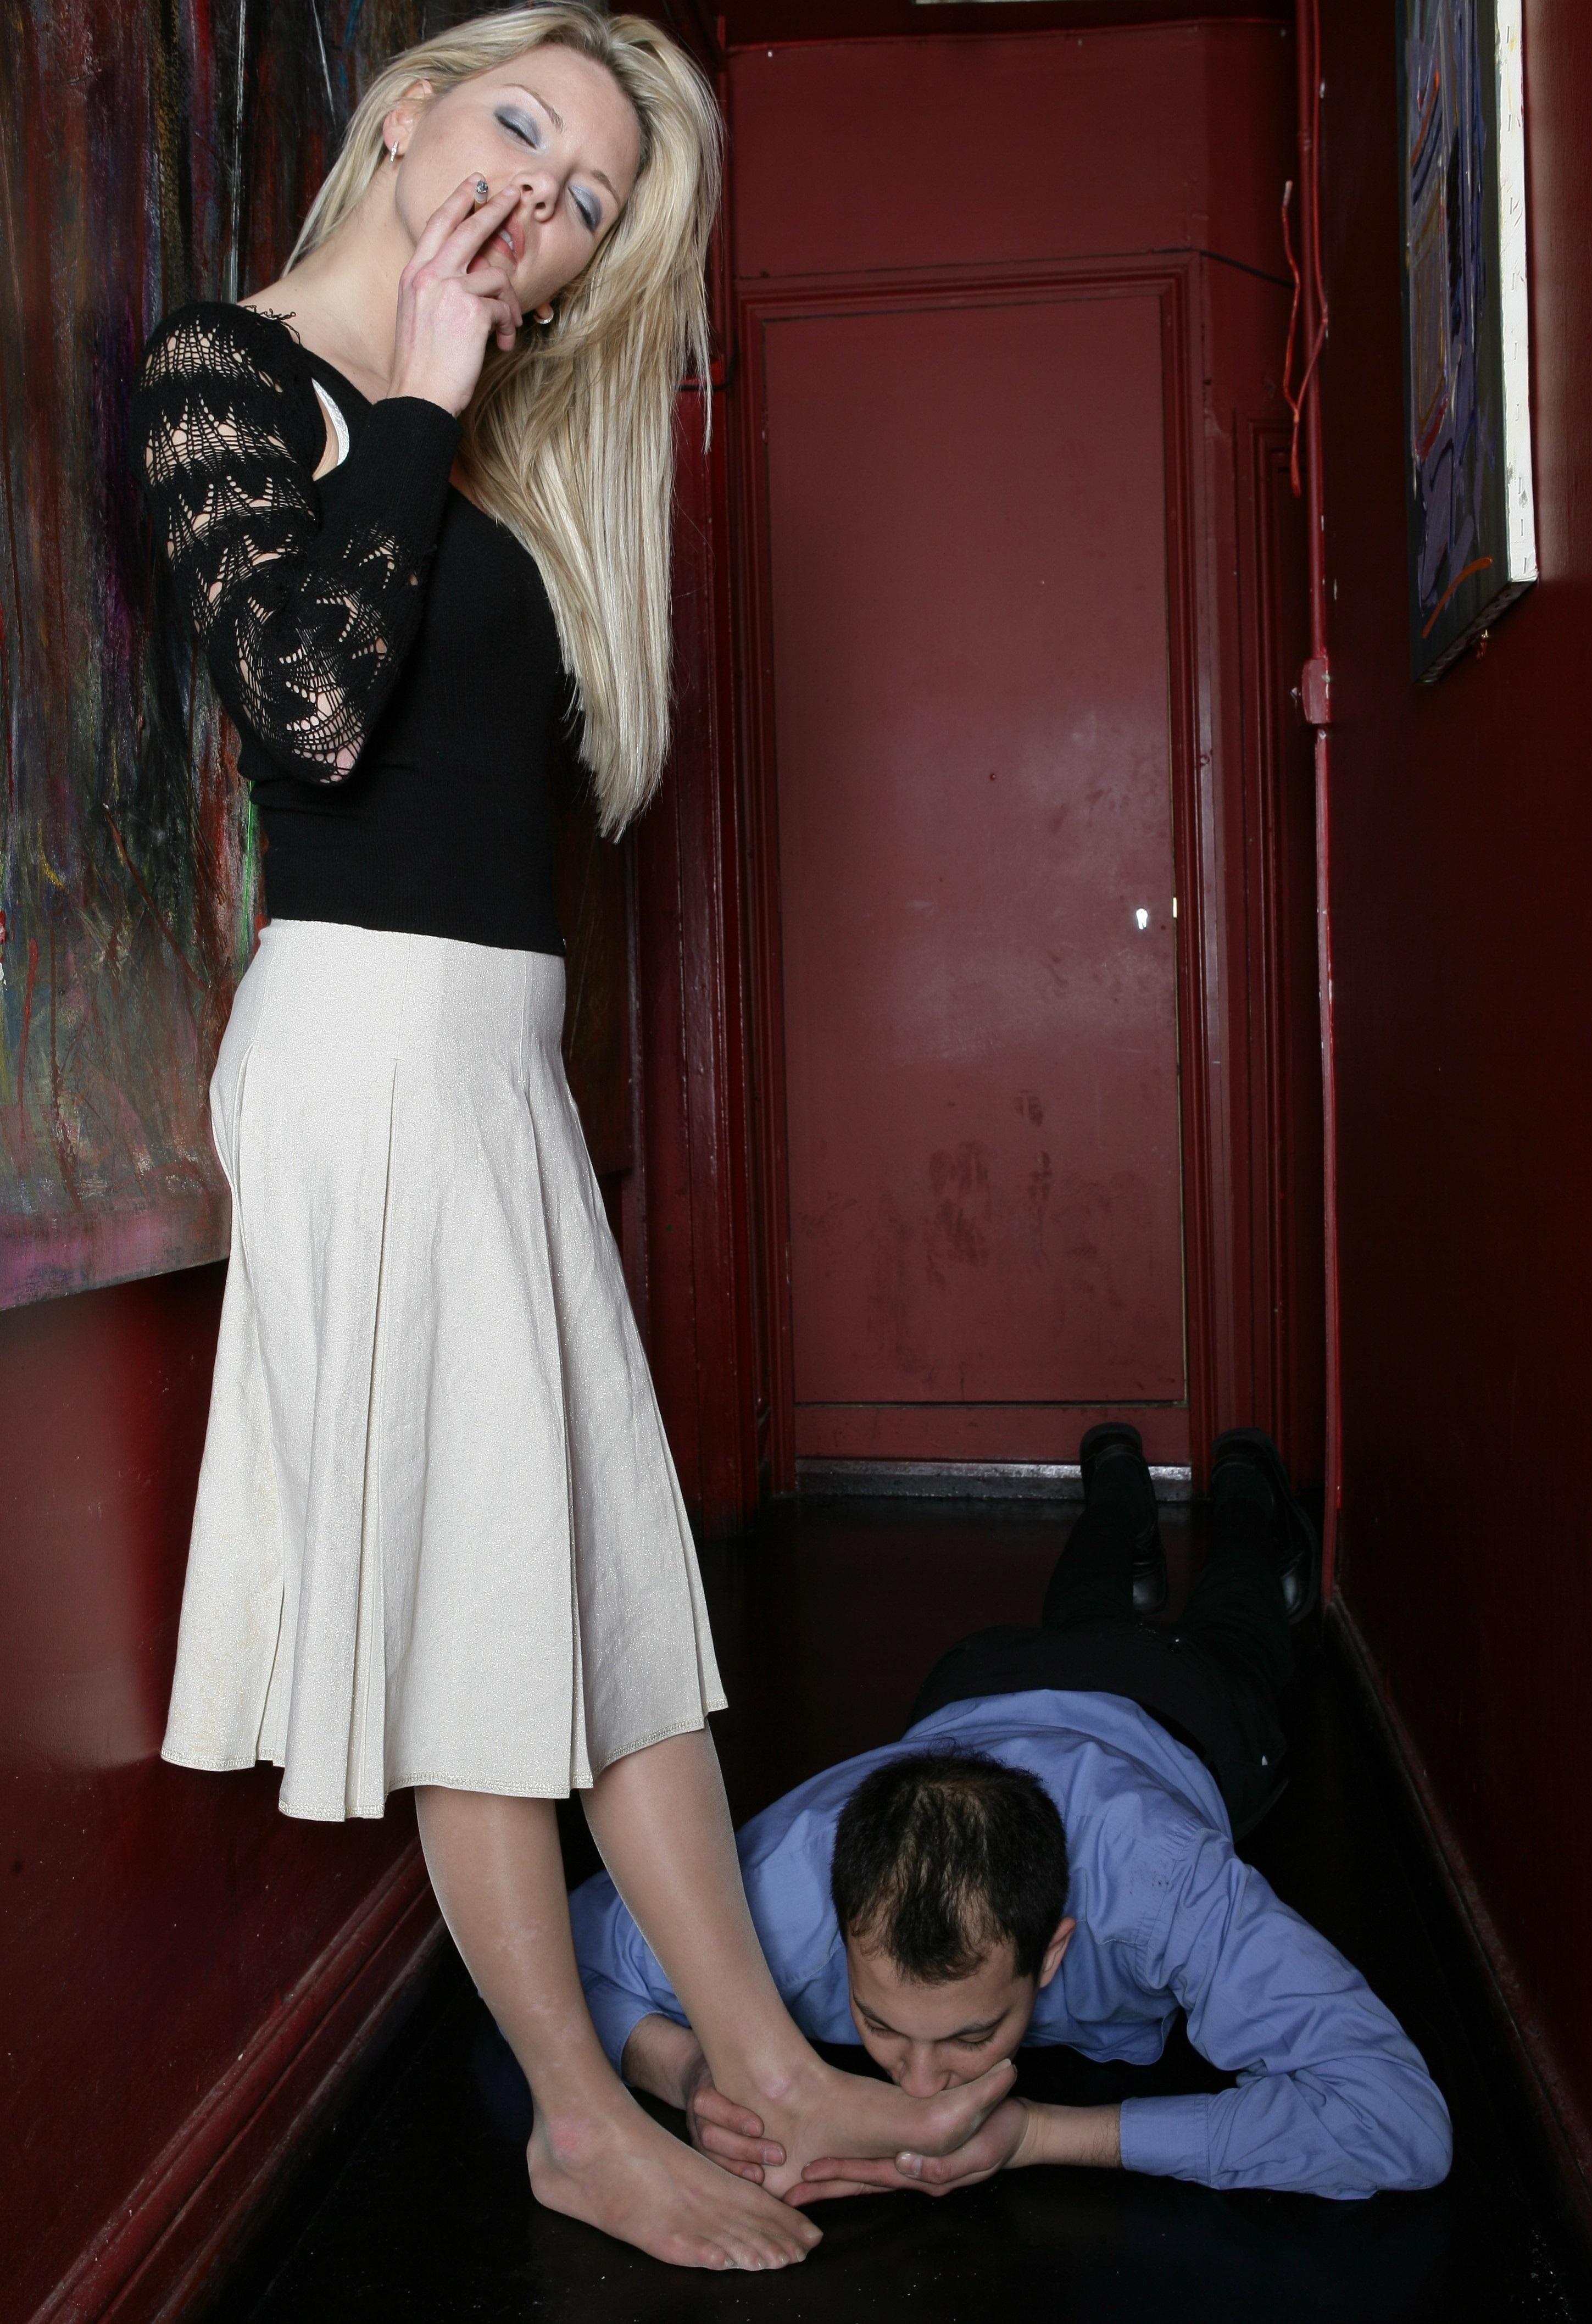 【SMエロ画像】跪きなさい…セクシー女王様によるありがたいお仕置きの数々www 22